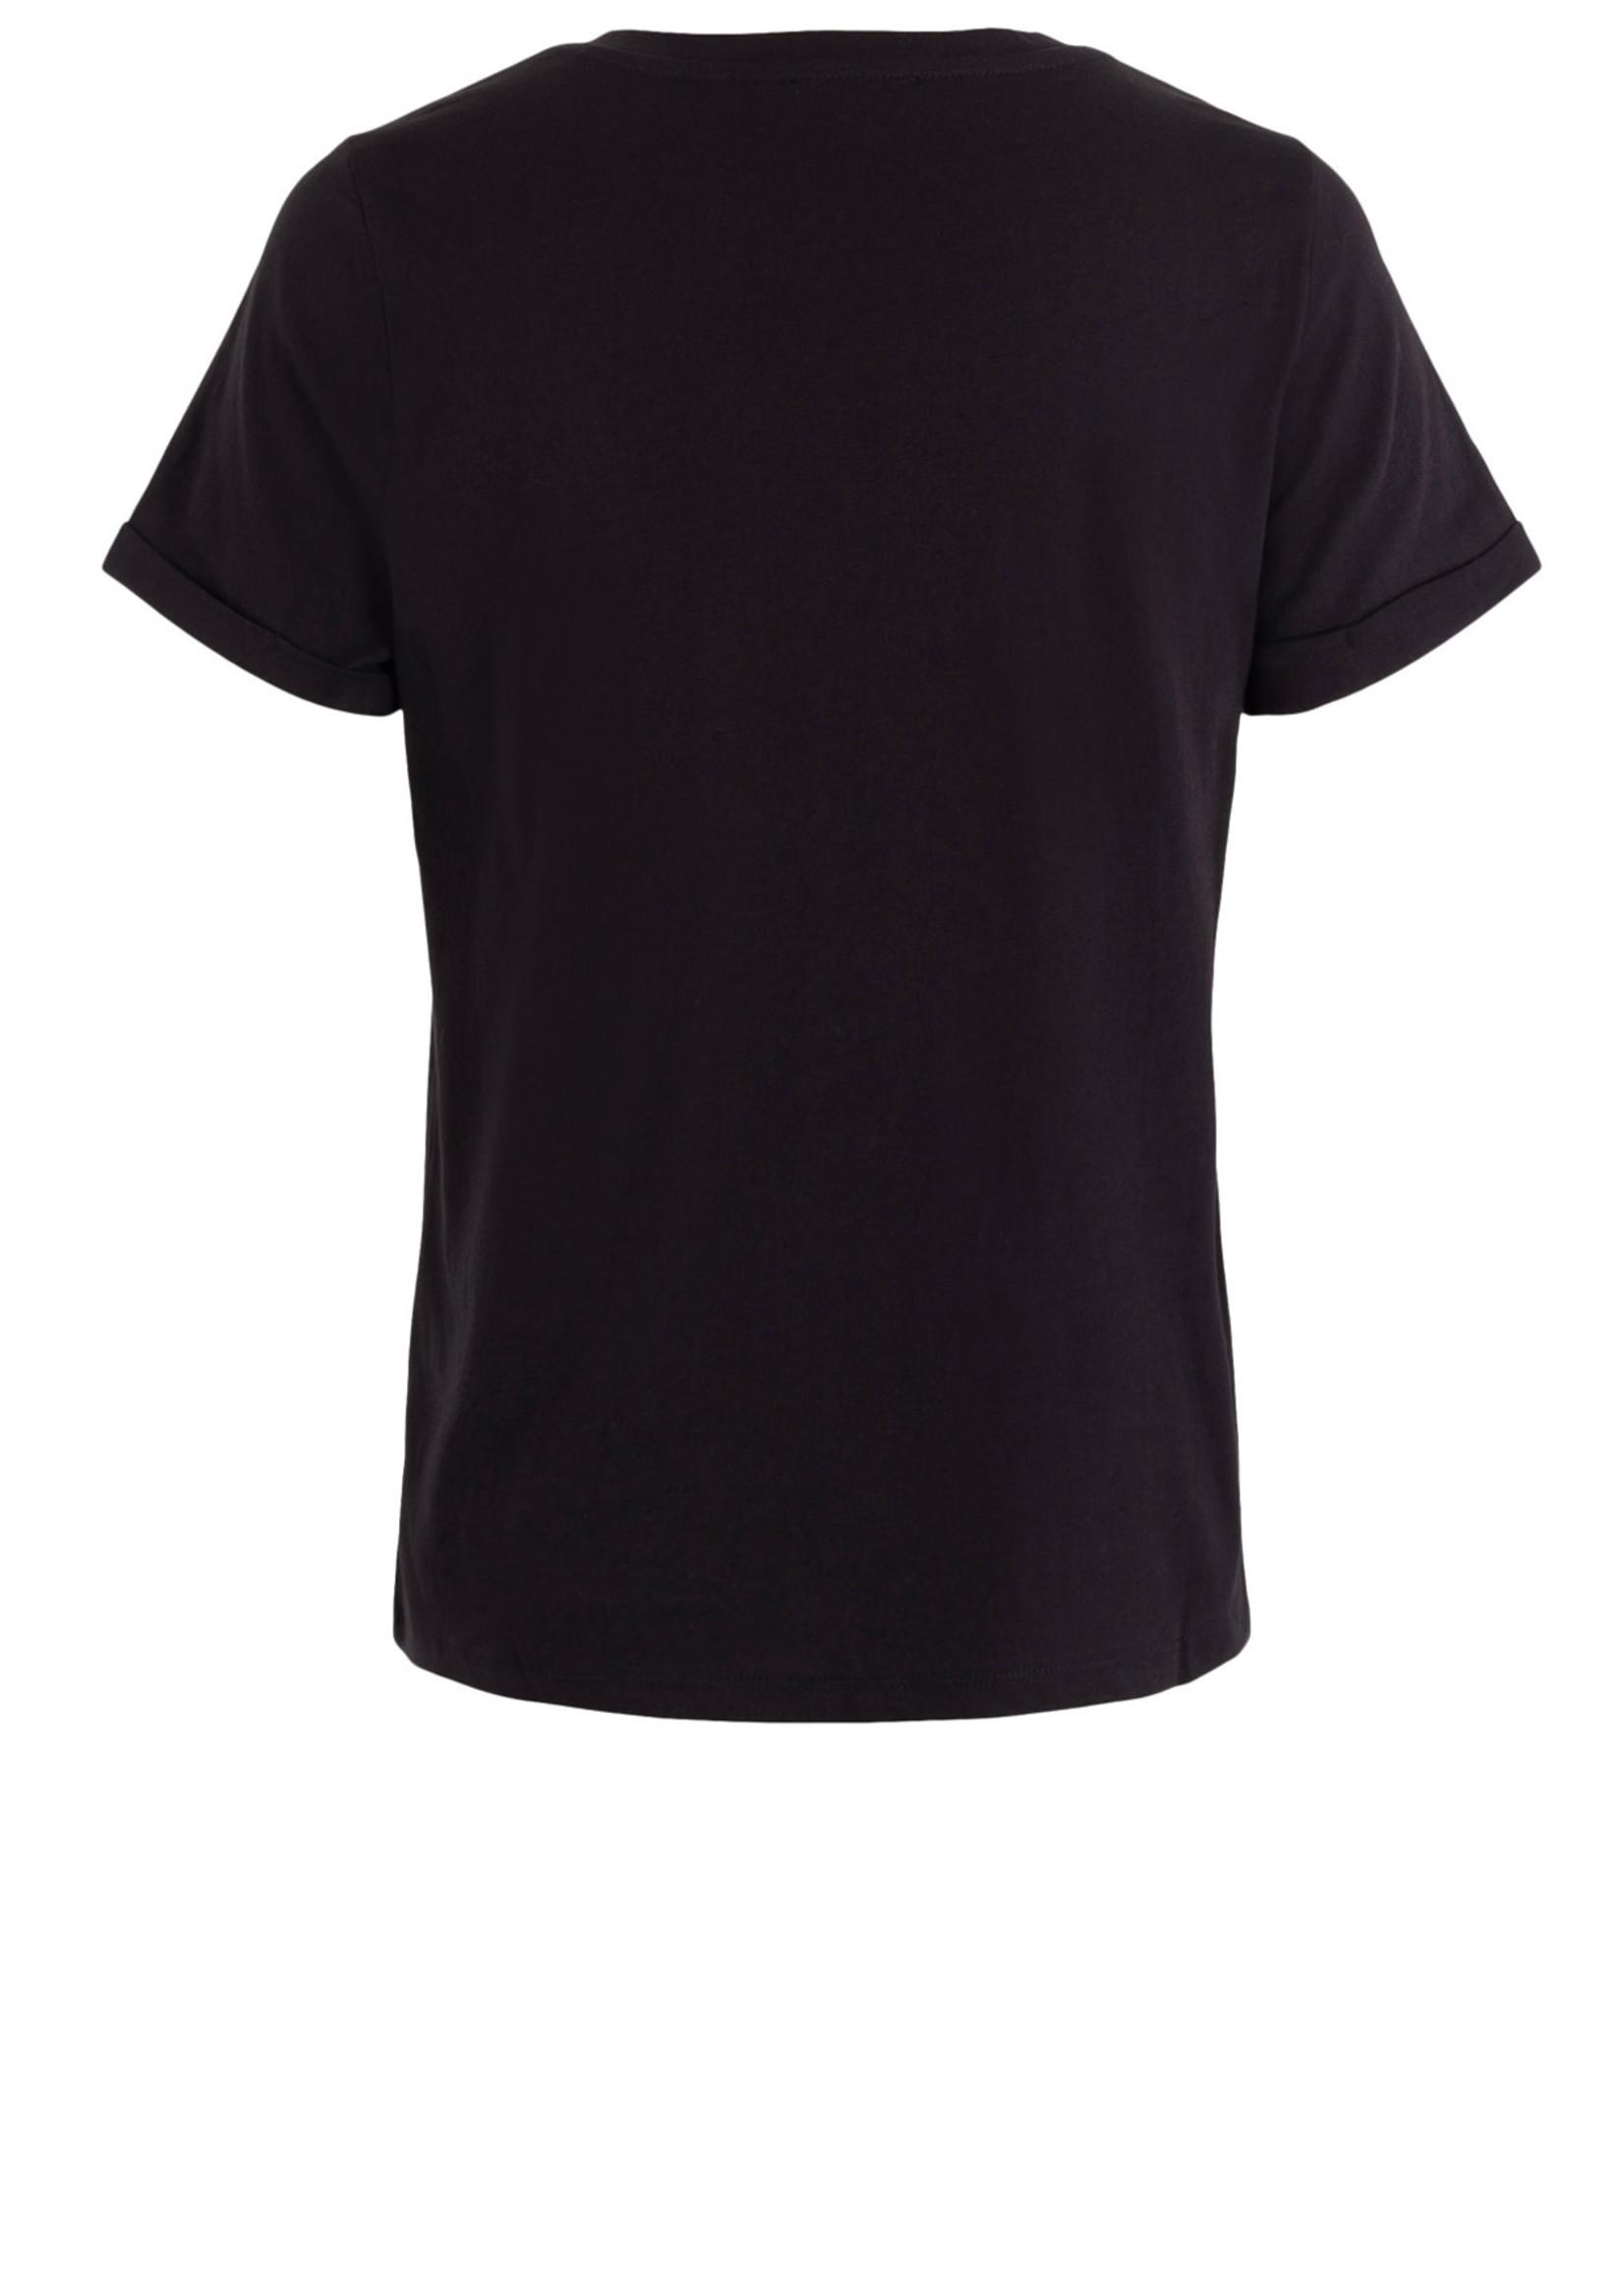 Anna T-shirt Black Solid Black Silver Stars